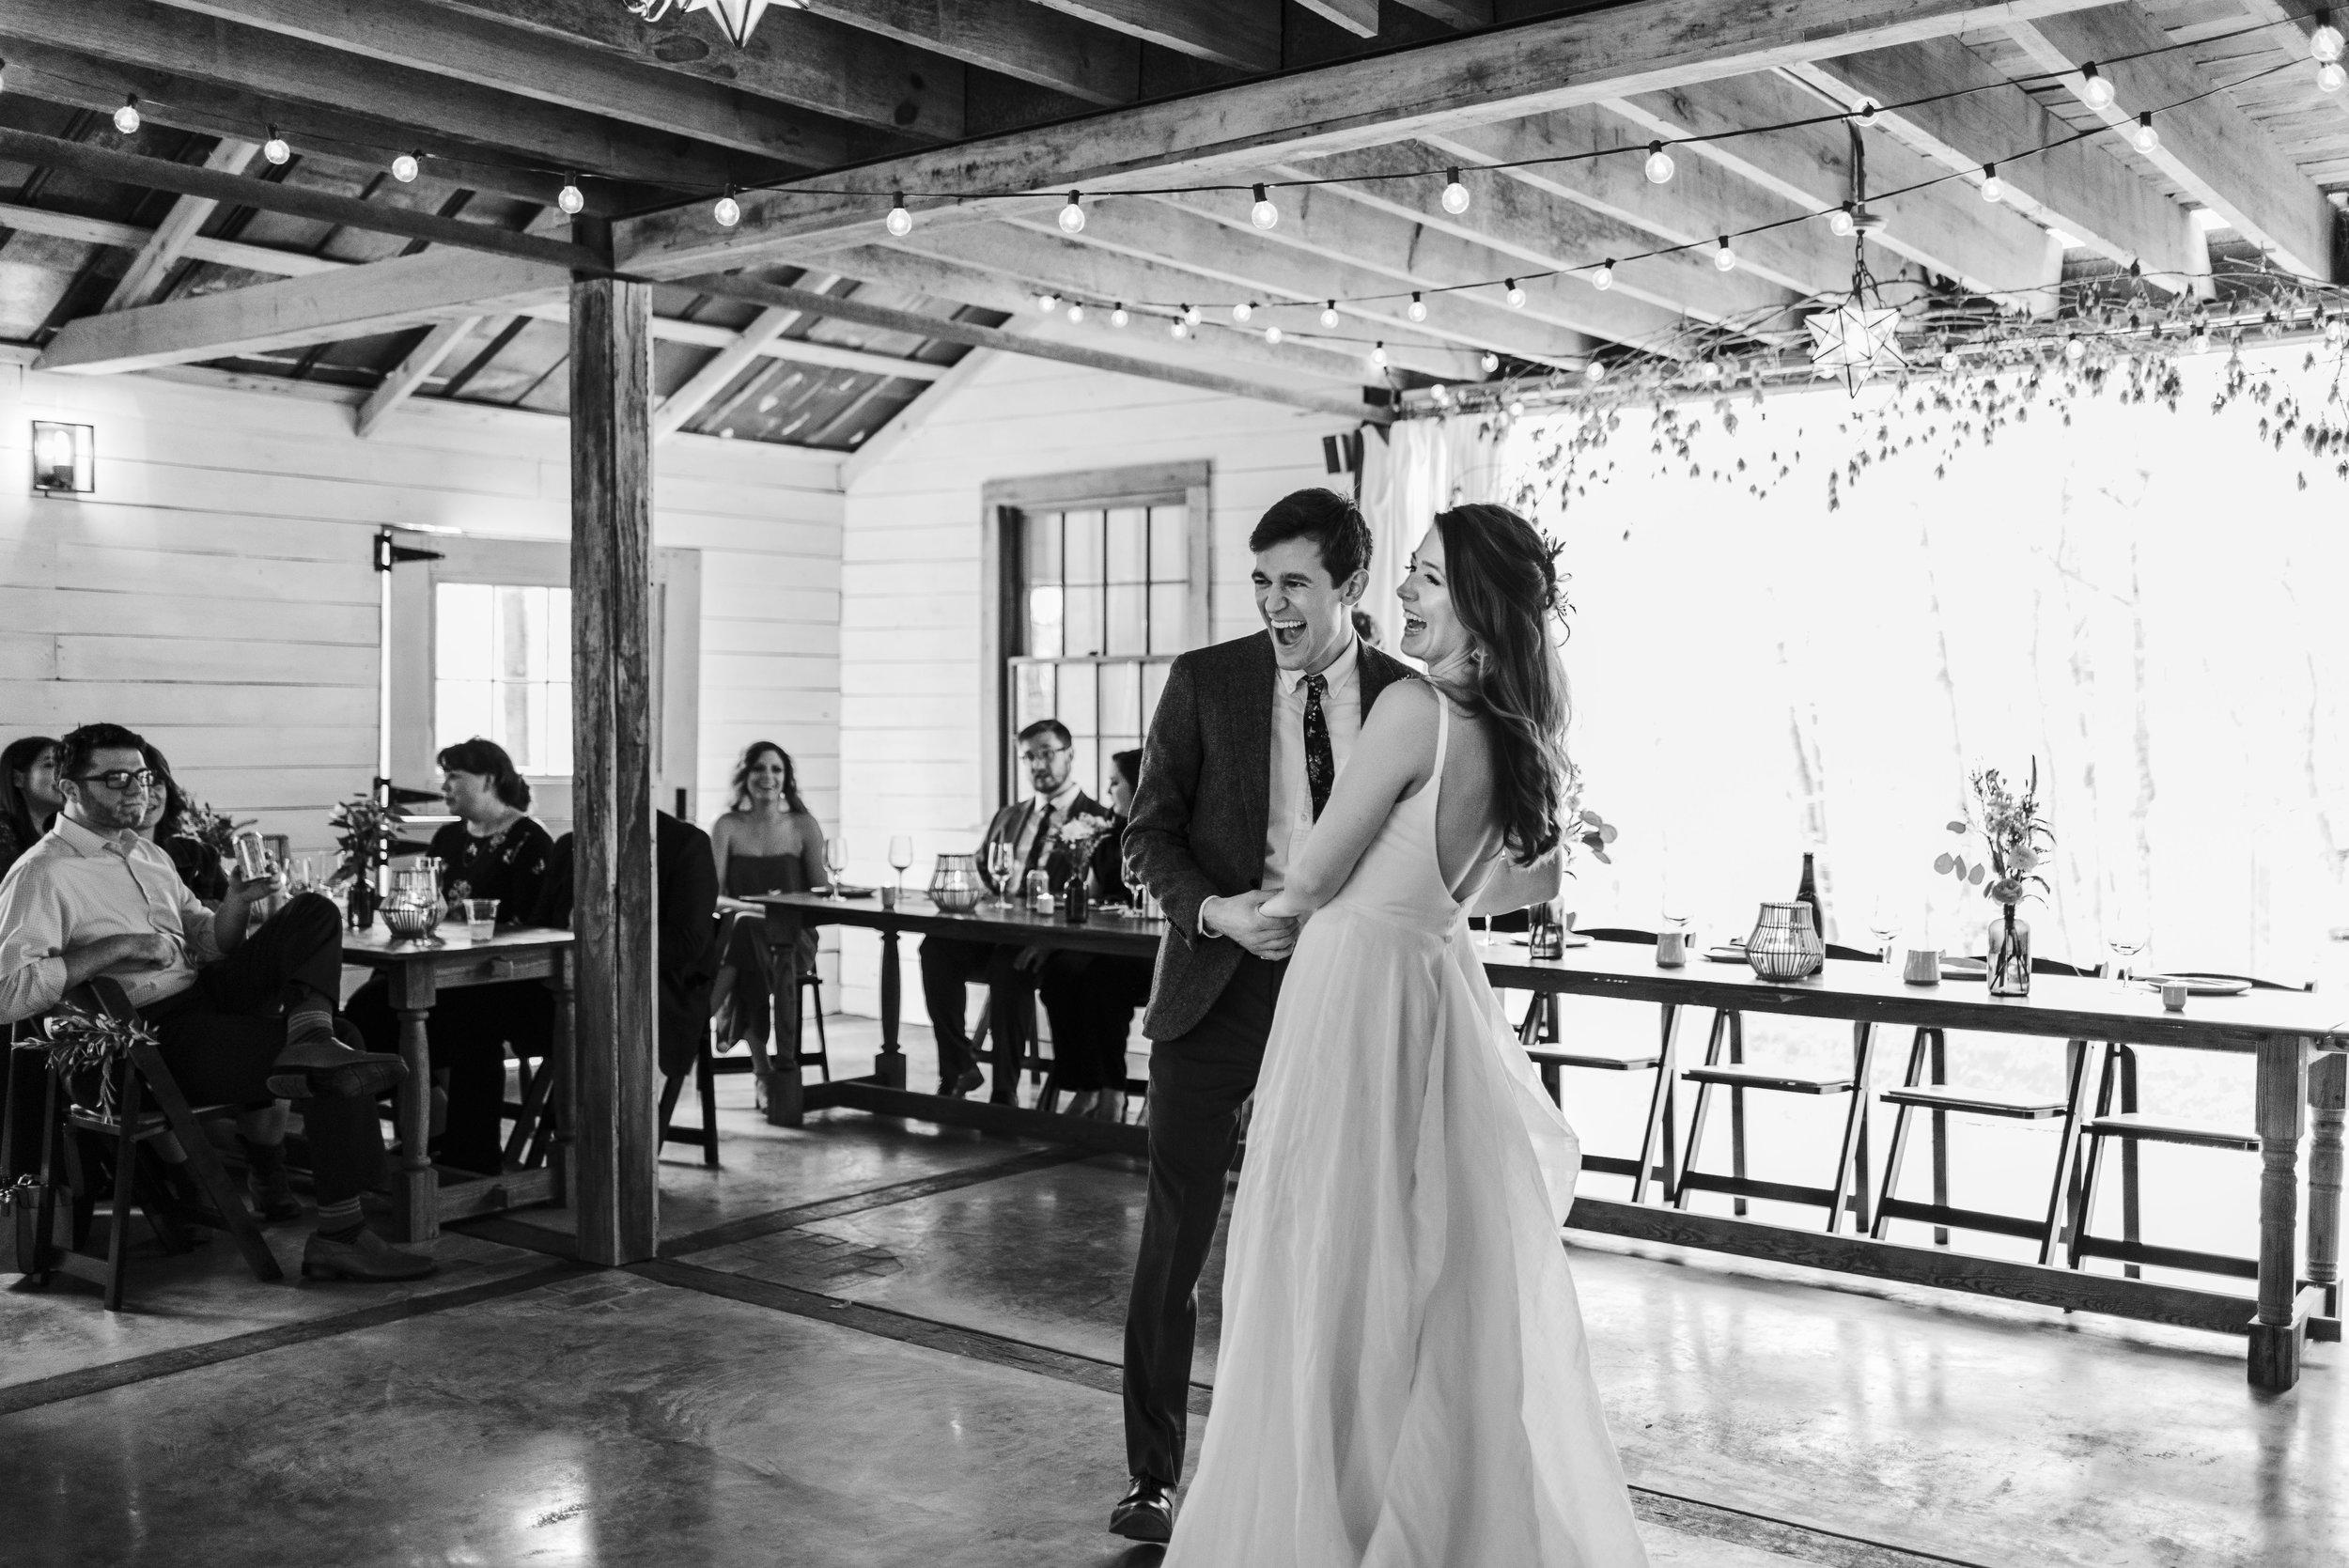 wedding bride groom couple first dance chattanooga Tennessee barn